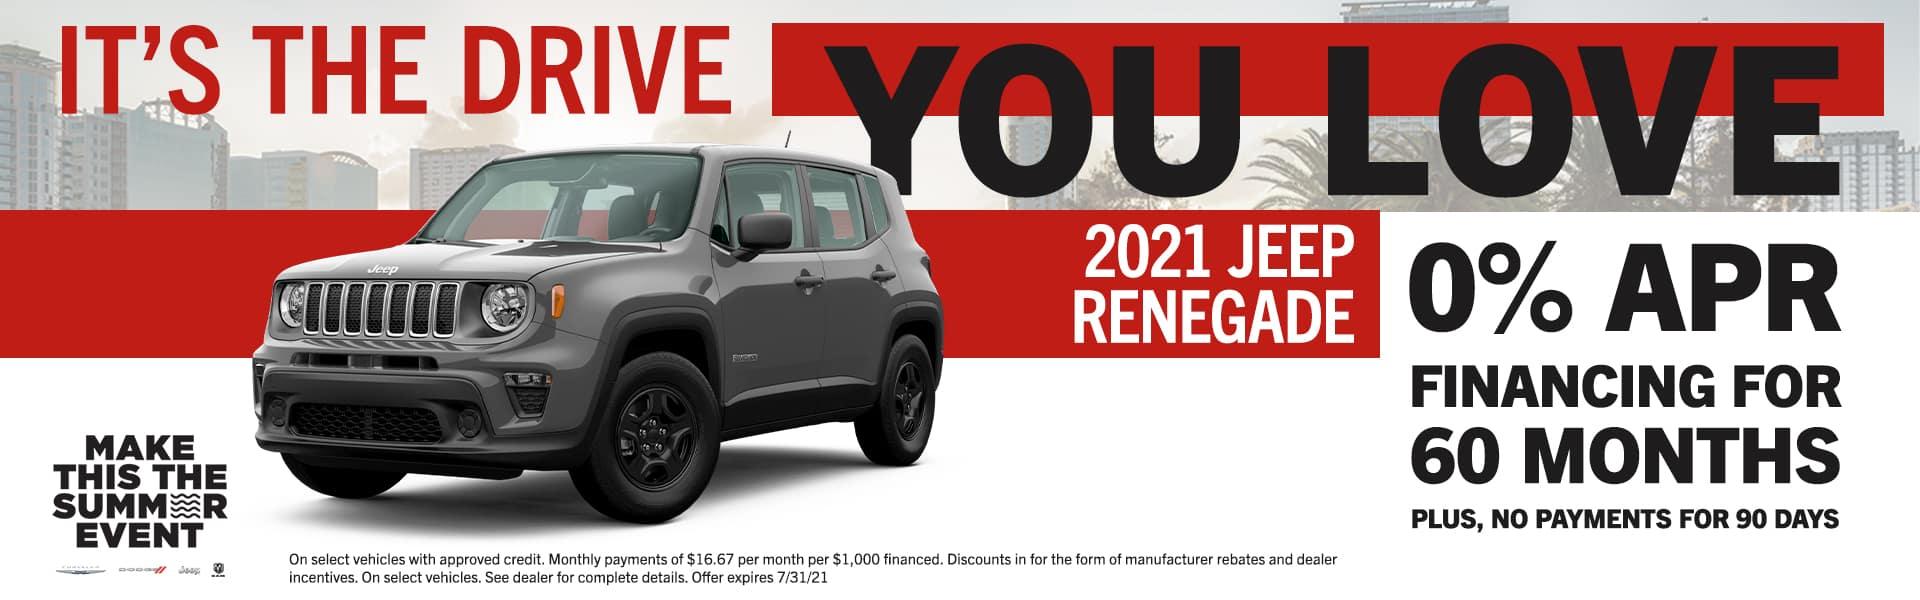 206-0721-CFC1147_July_SL-Jeep-Renegade